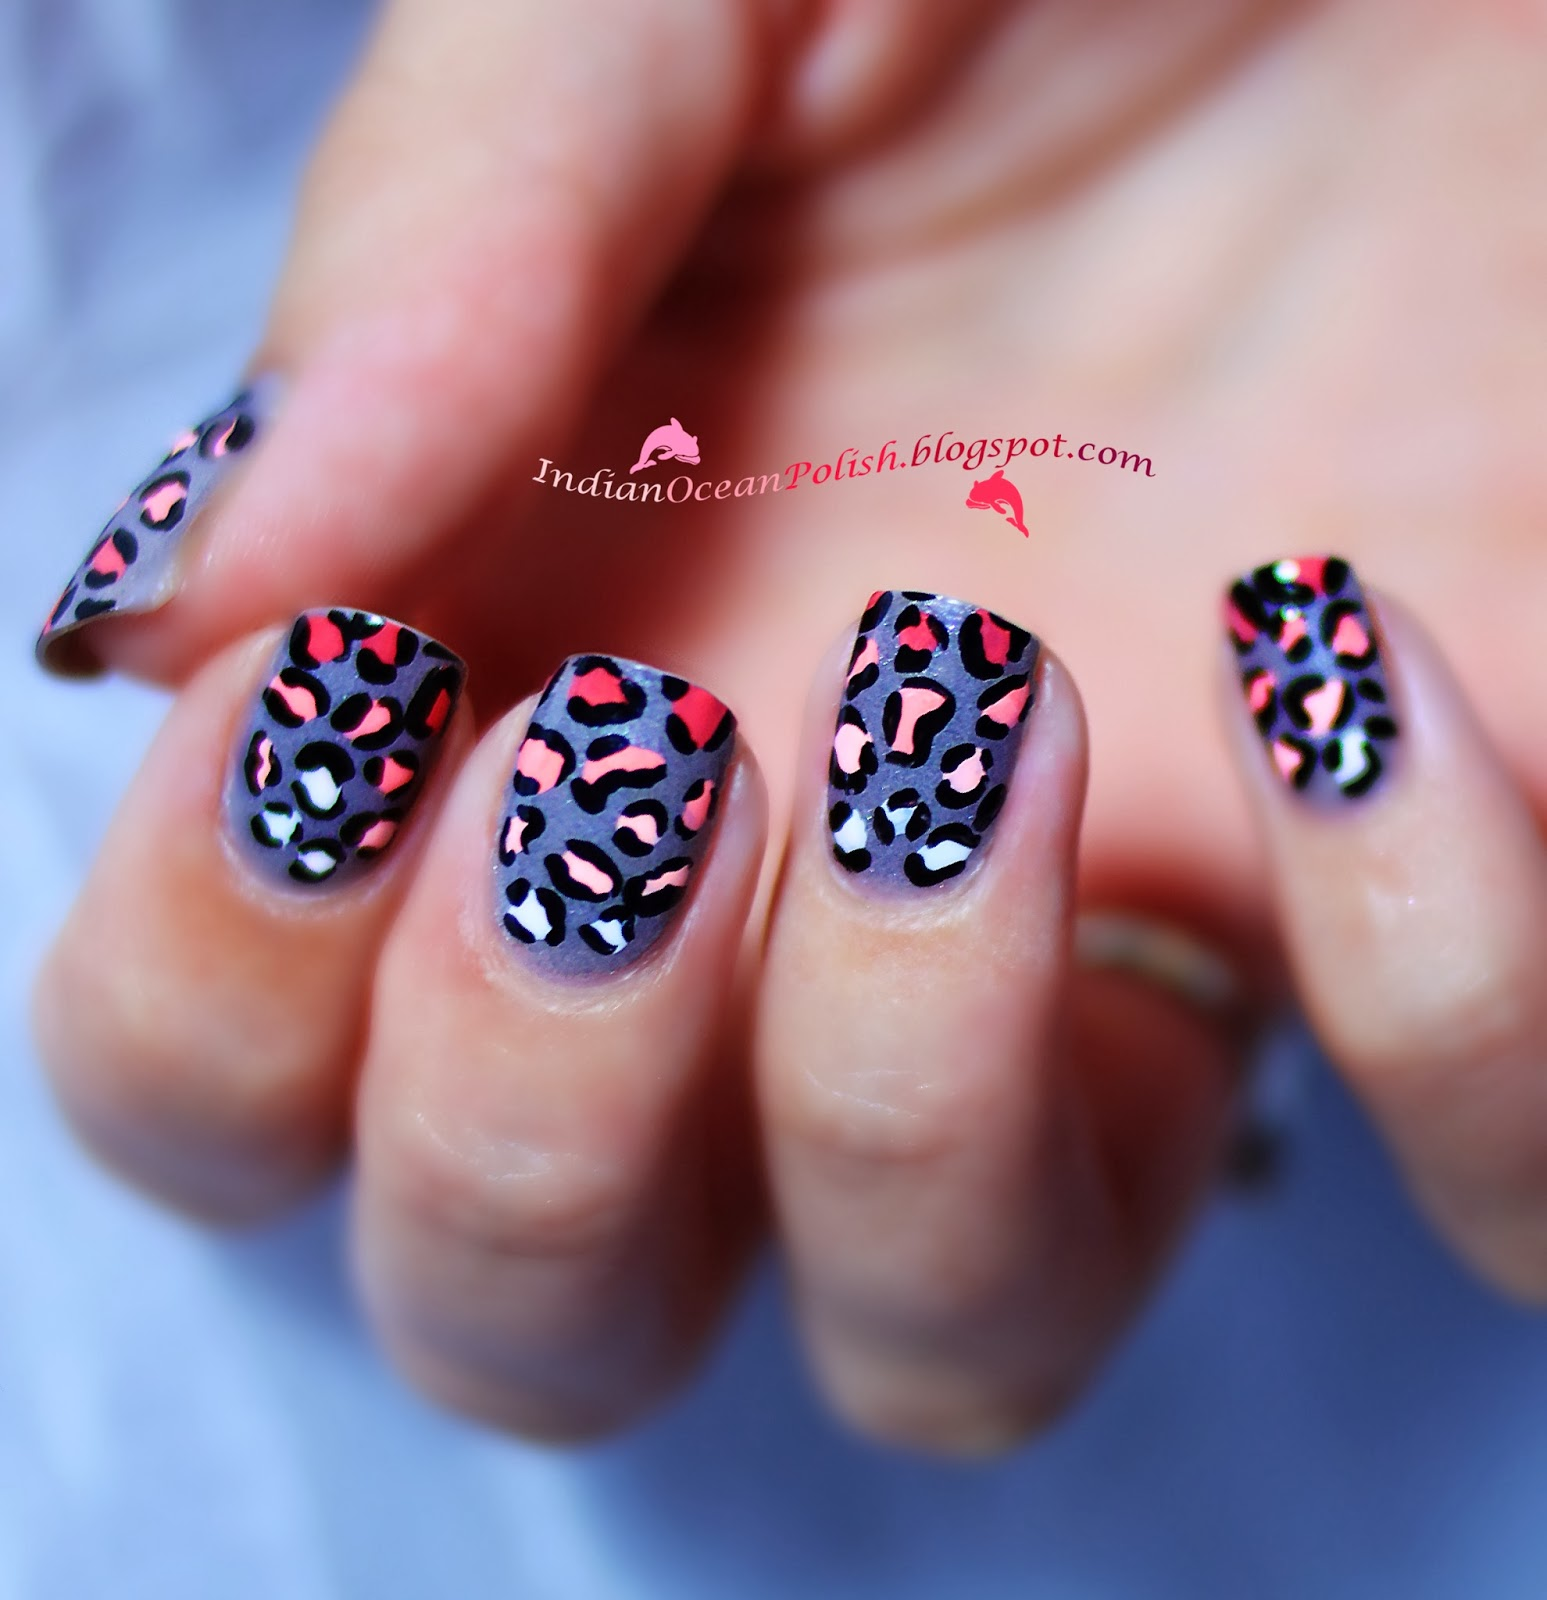 Amazing Flip Flop Nail Art Gift - Nail Art Ideas - morihati.com